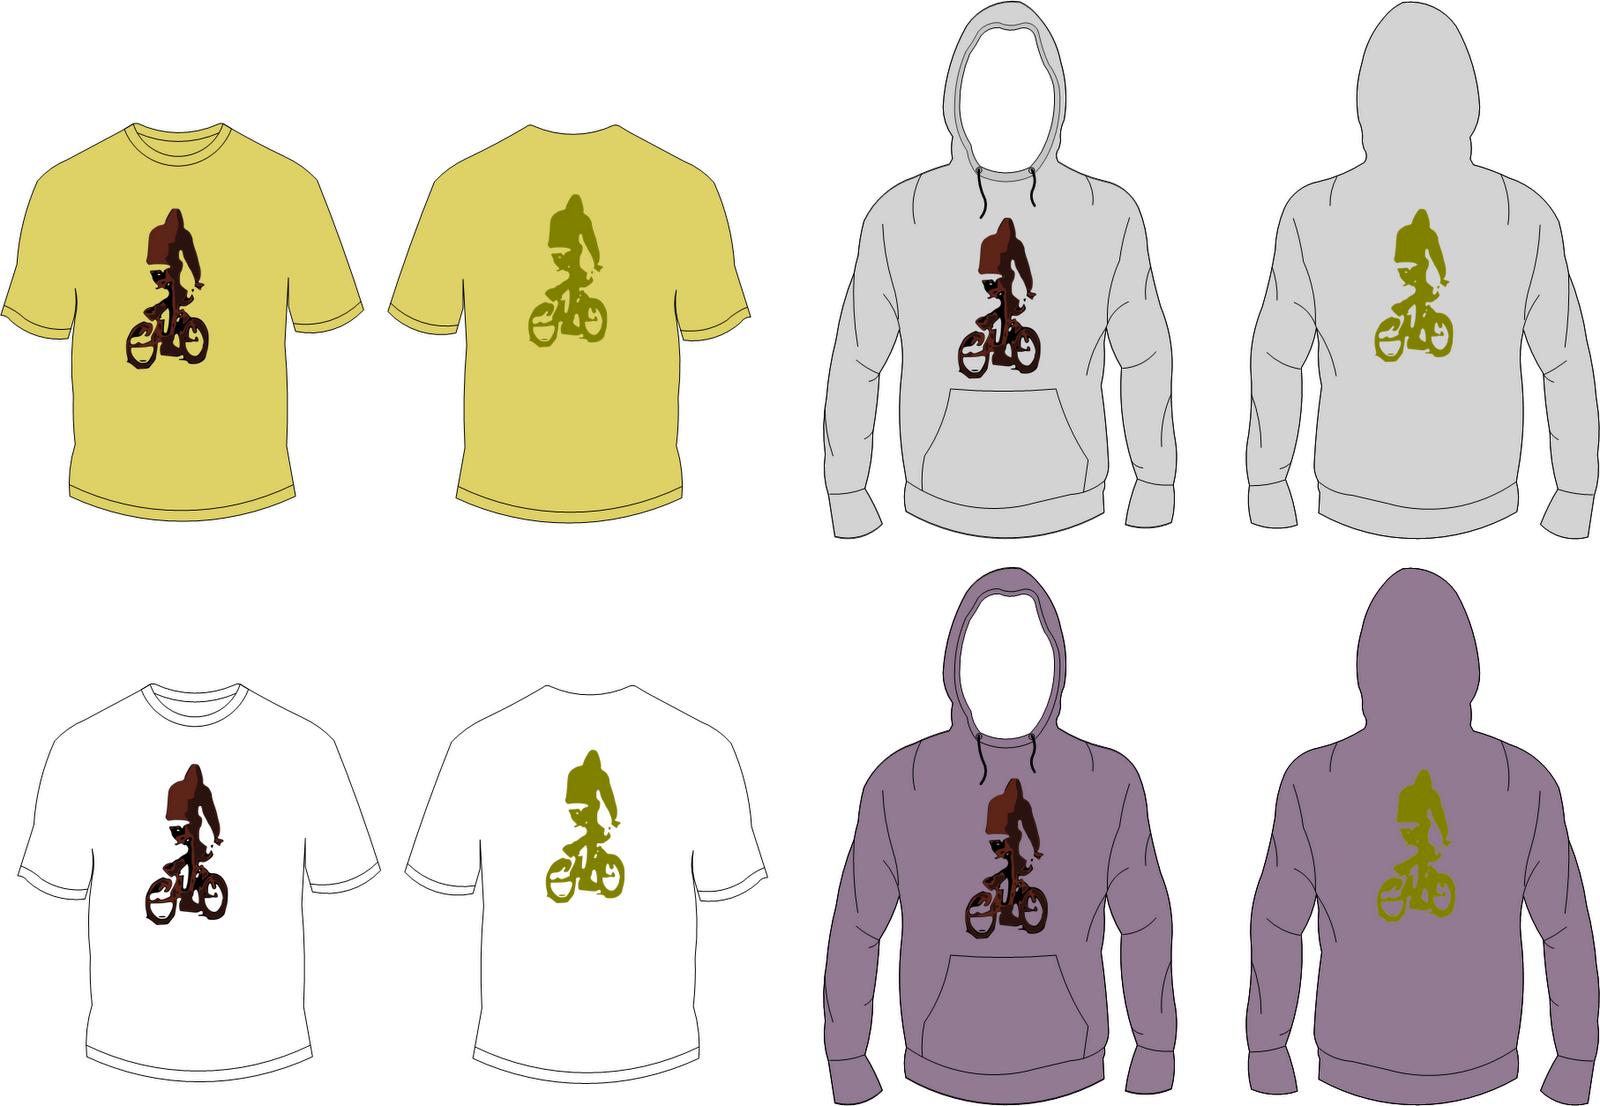 Shirt design blog - Shirt Design Blog 11